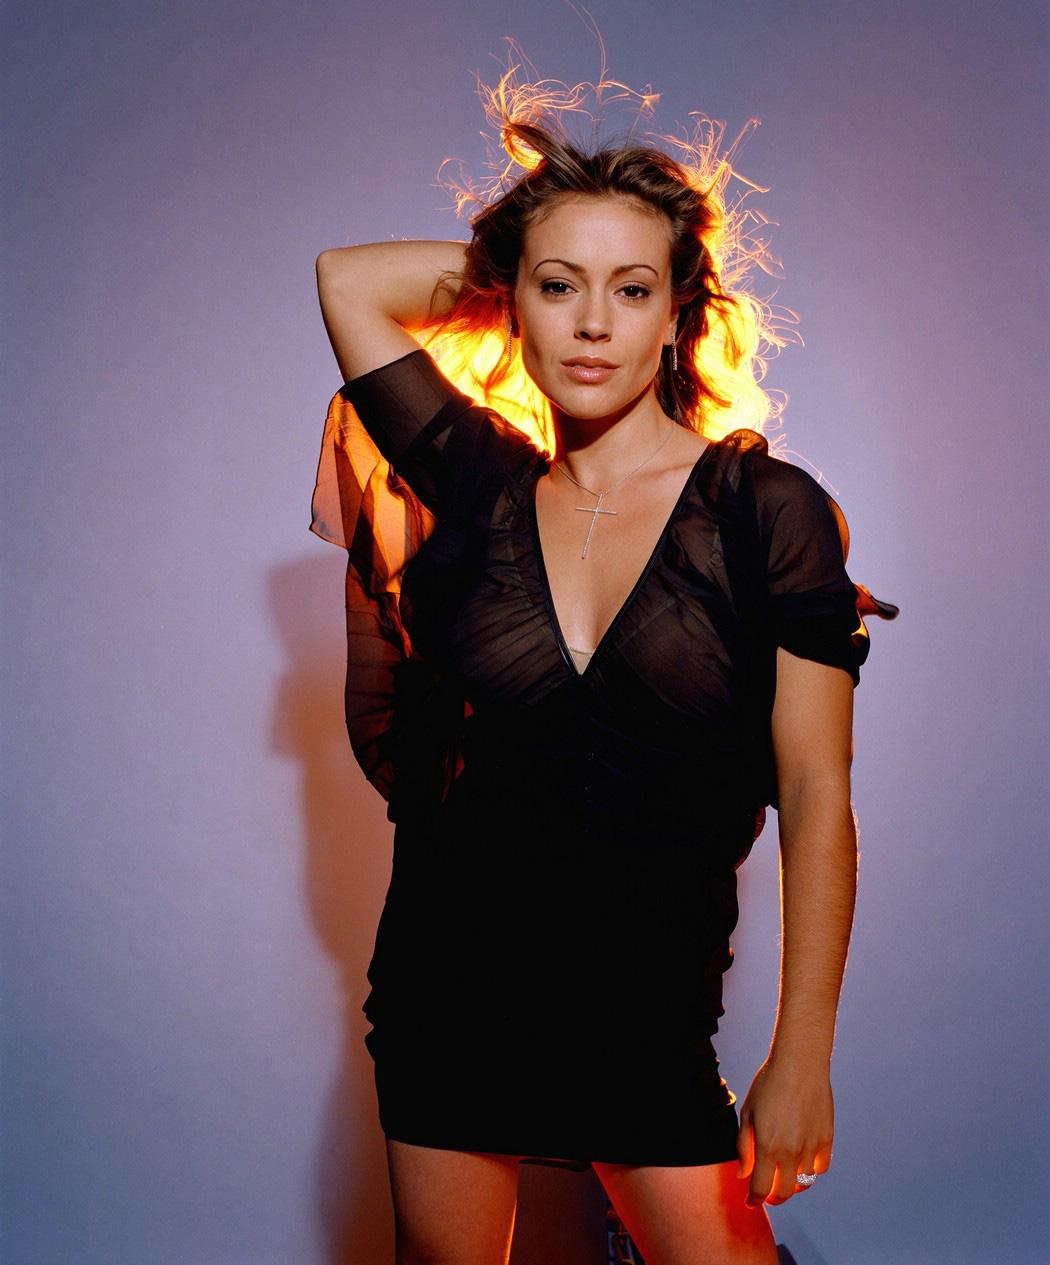 Hollywood Actress Alyssa Milano Hot Photo Gallery  Hot Celebrity -9578